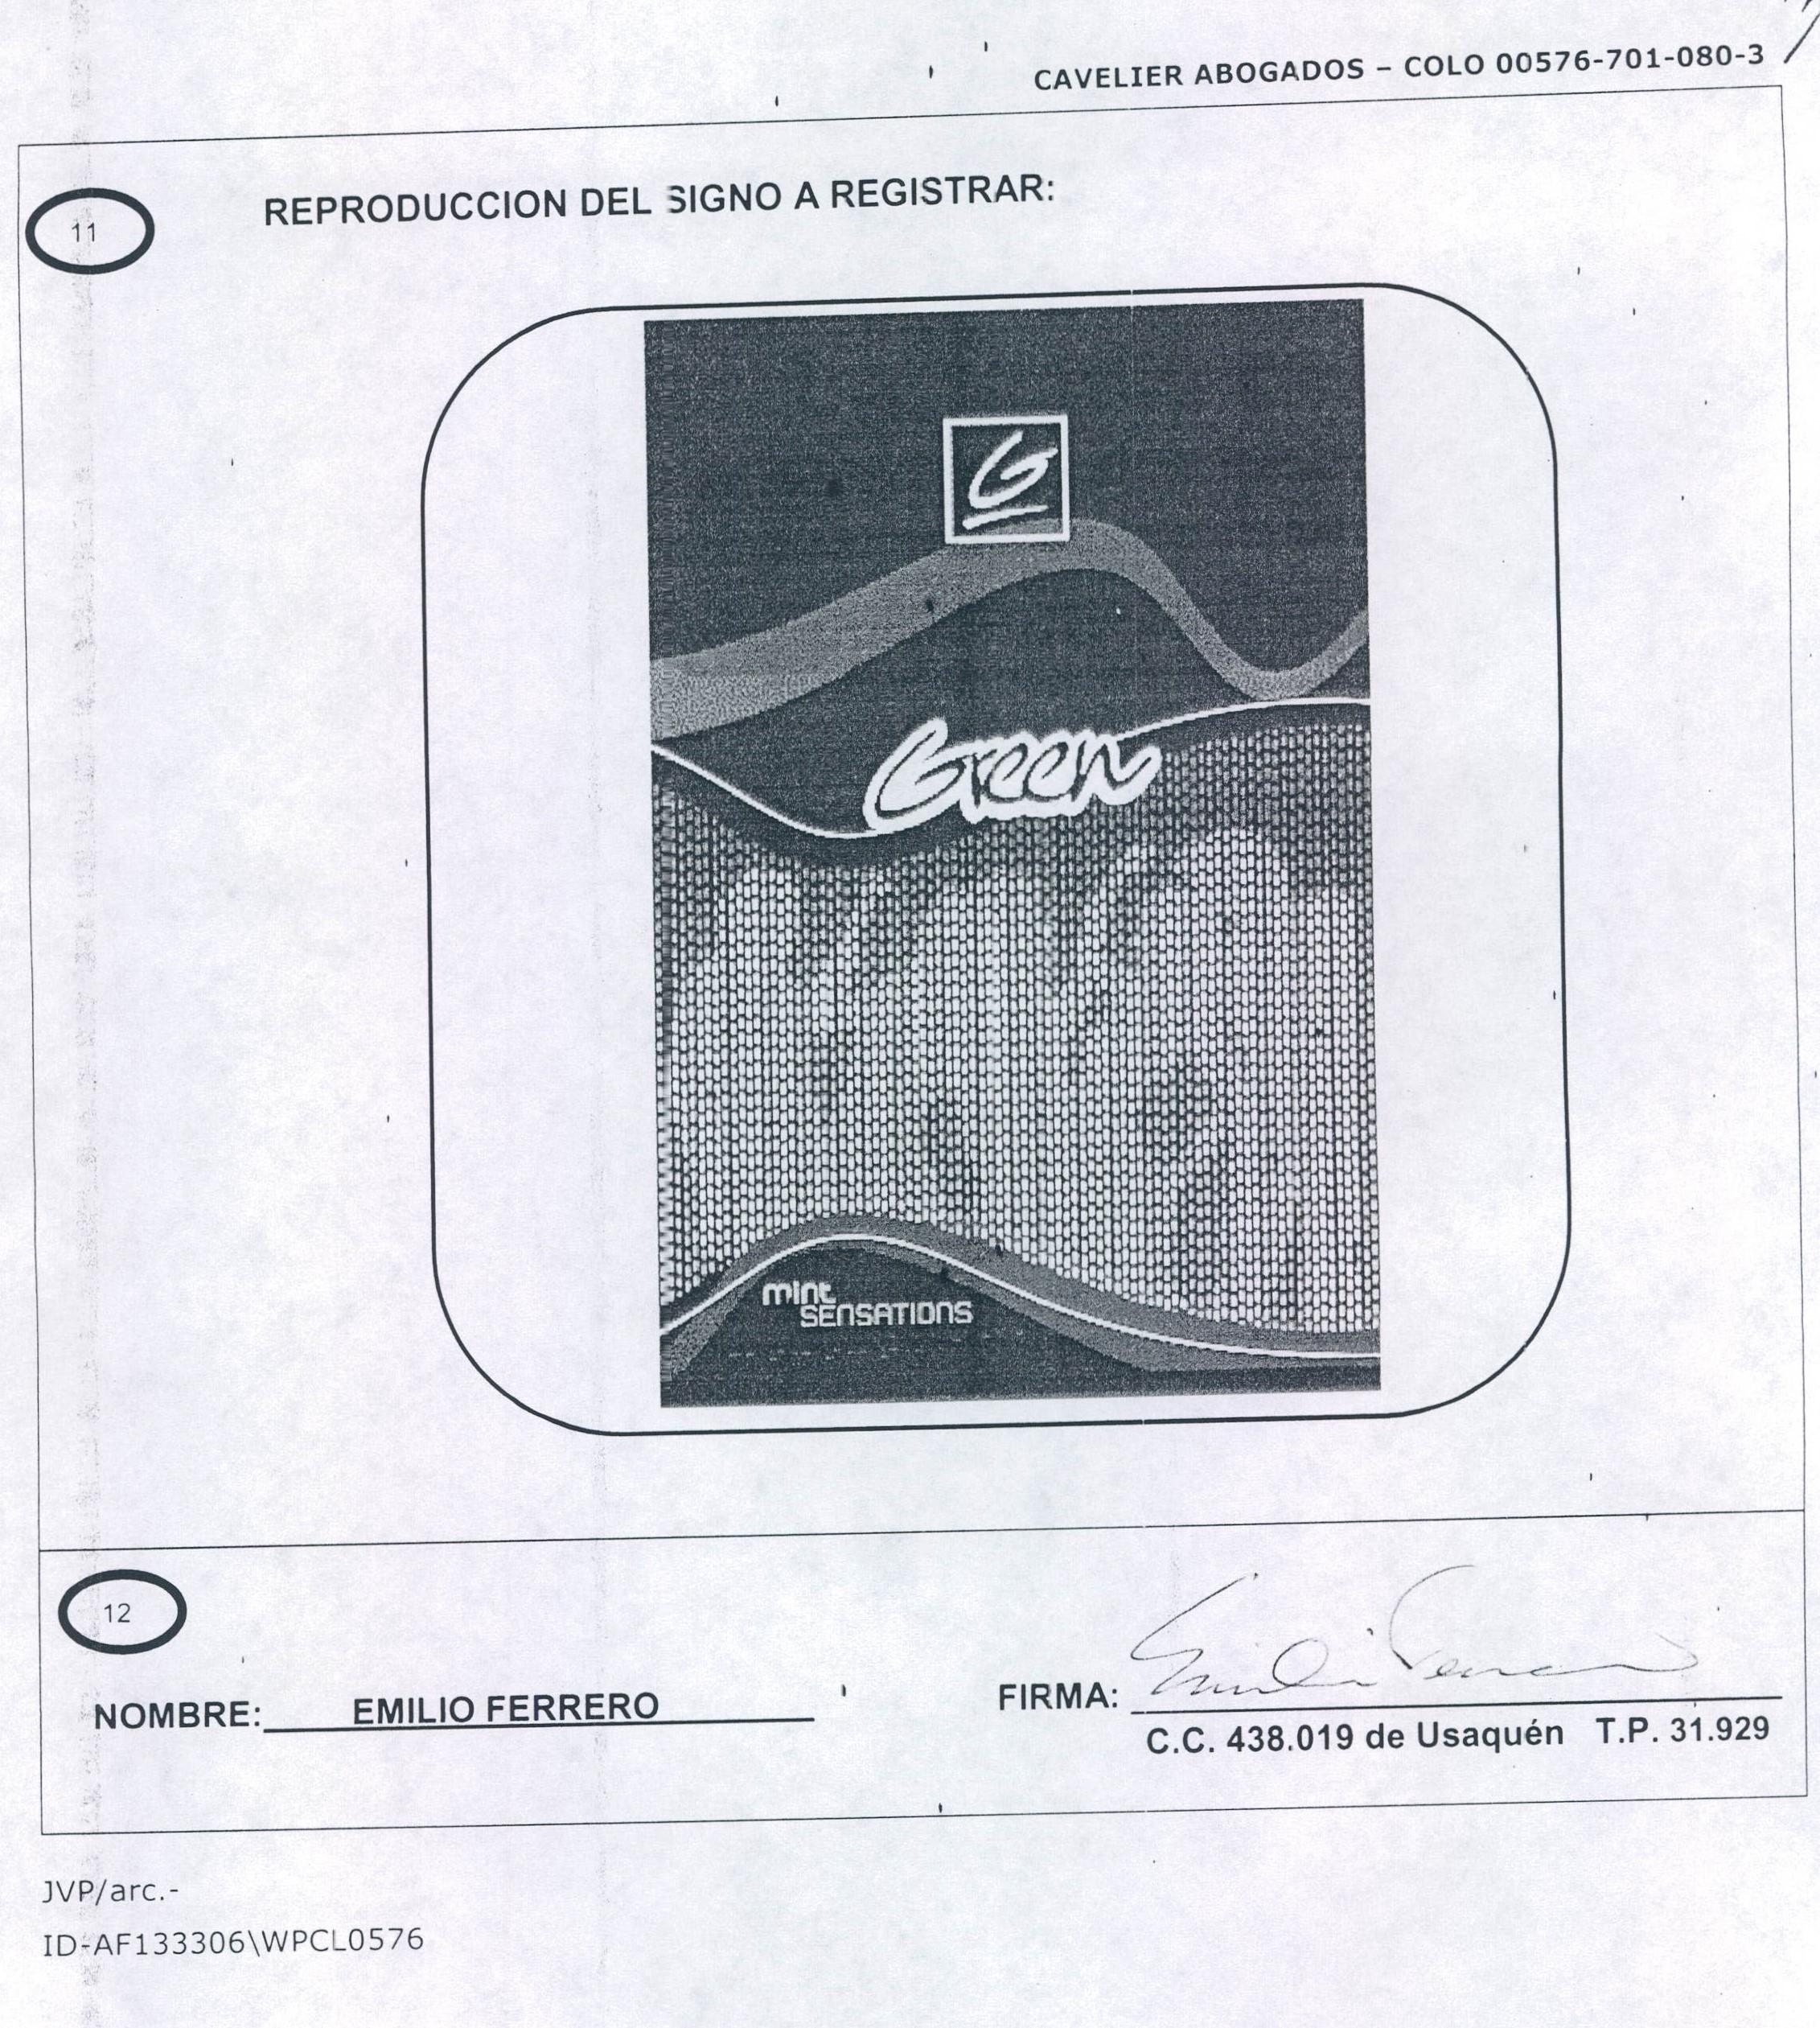 S-2010-00173-01